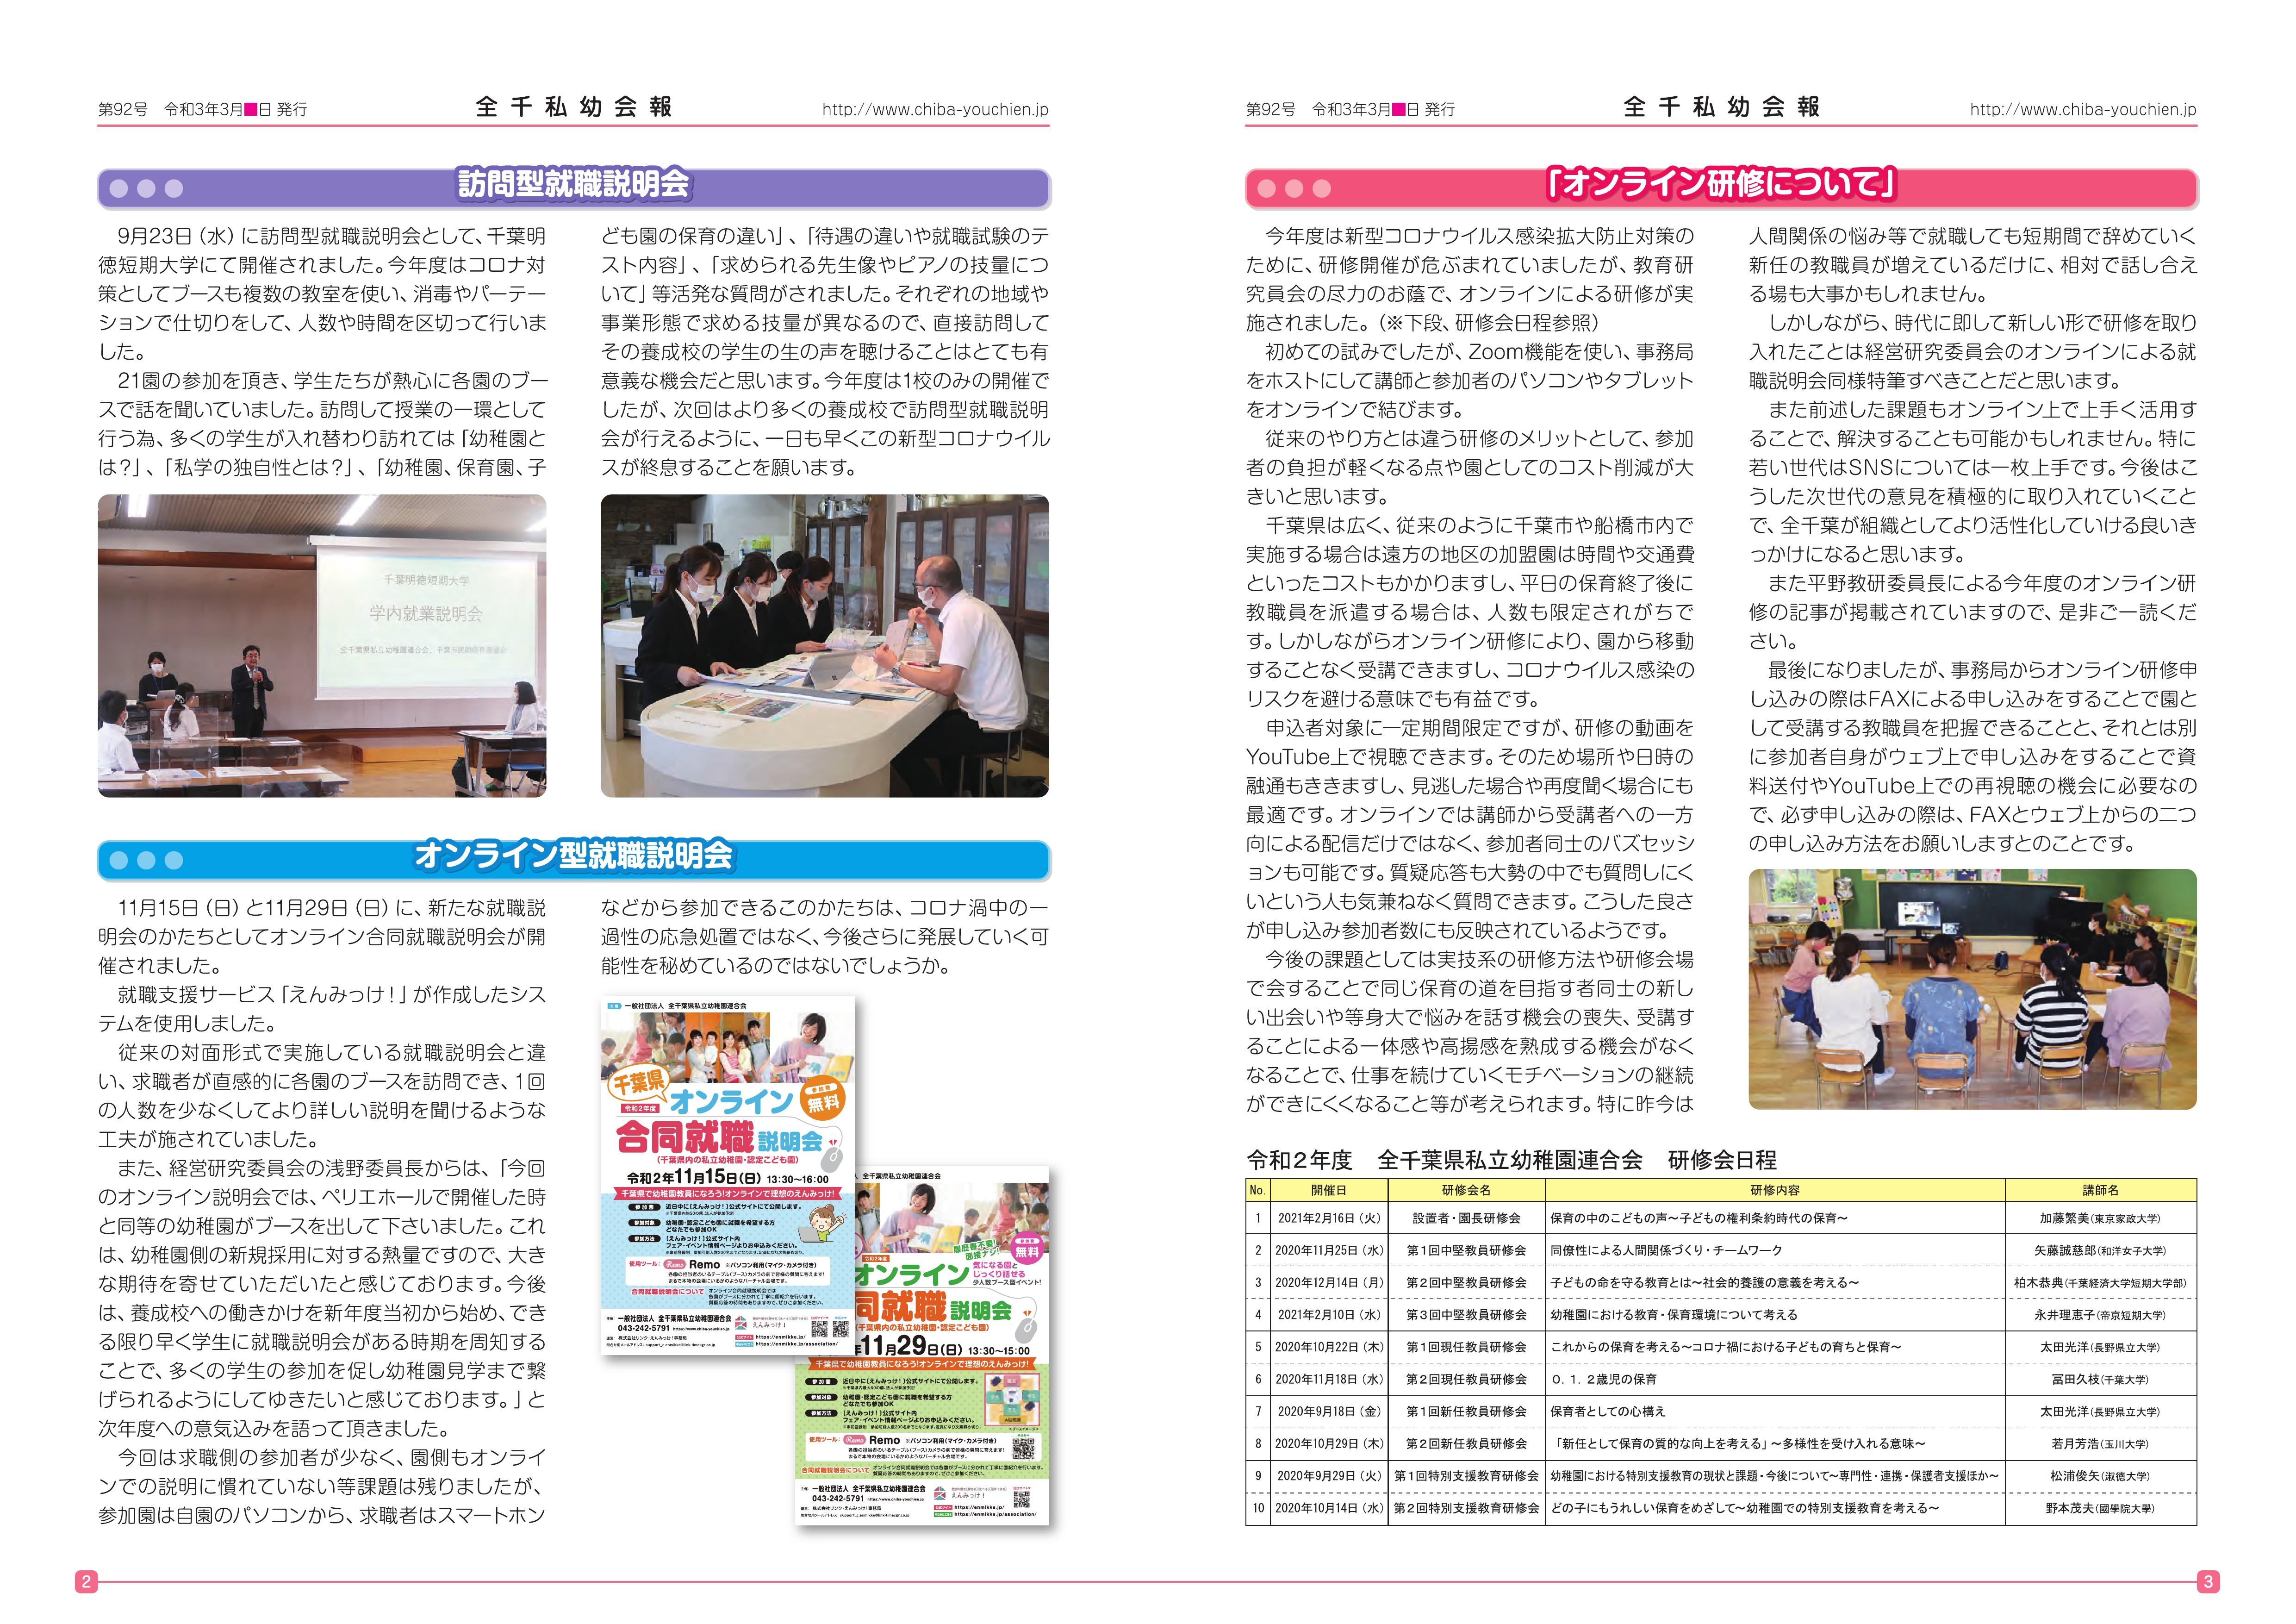 https://www.chiba-youchien.jp/news/92%E5%8F%B7P2_P3_0322.jpg